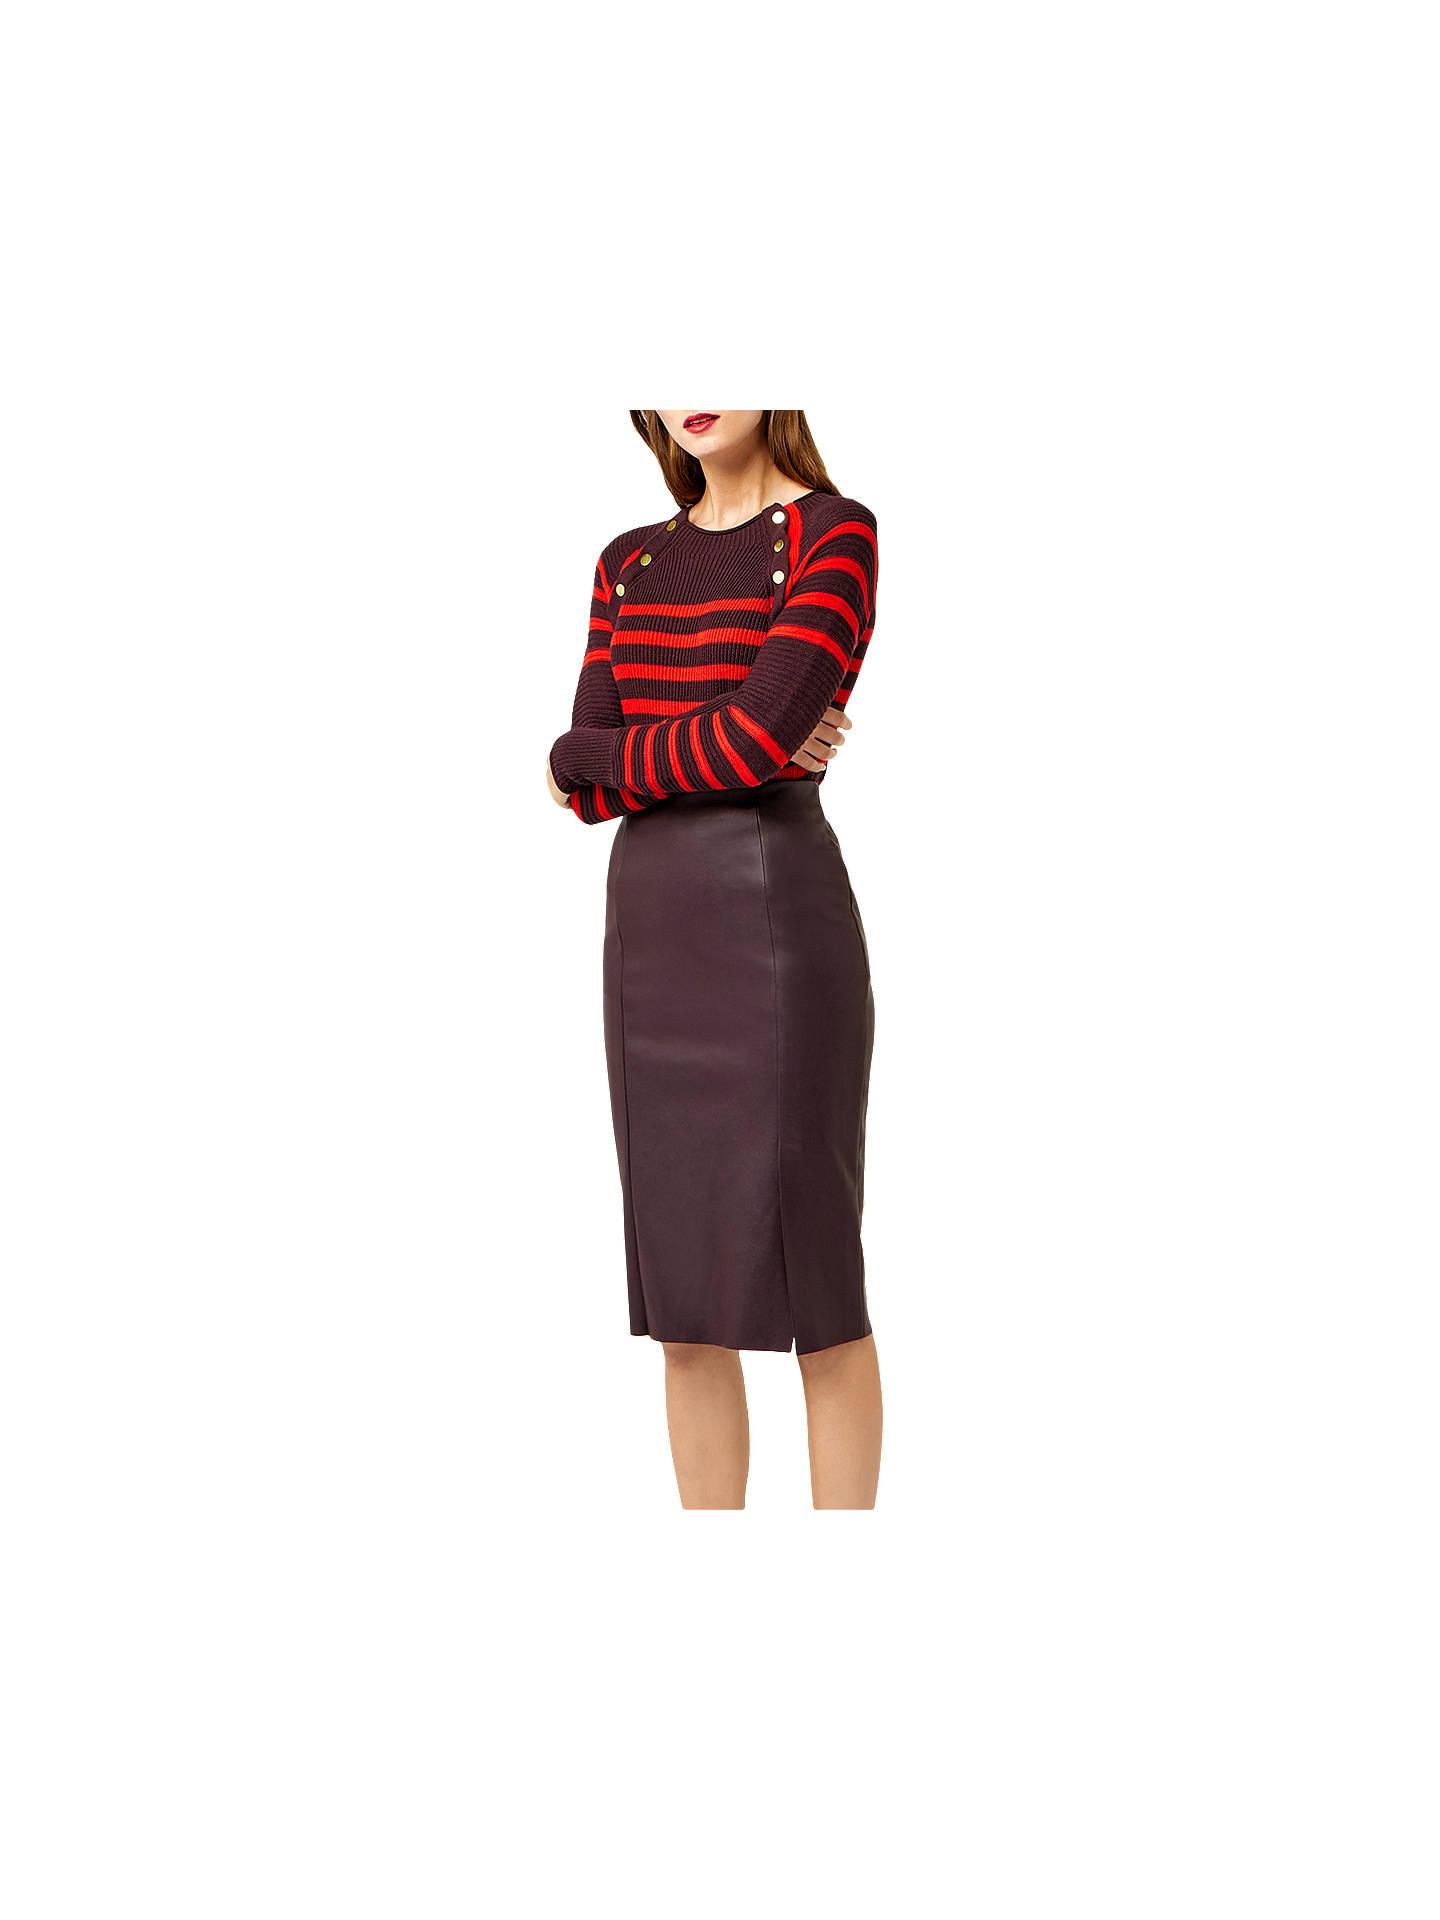 d5da94964 Warehouse Dark Red Faux Leather Skirt - raveitsafe